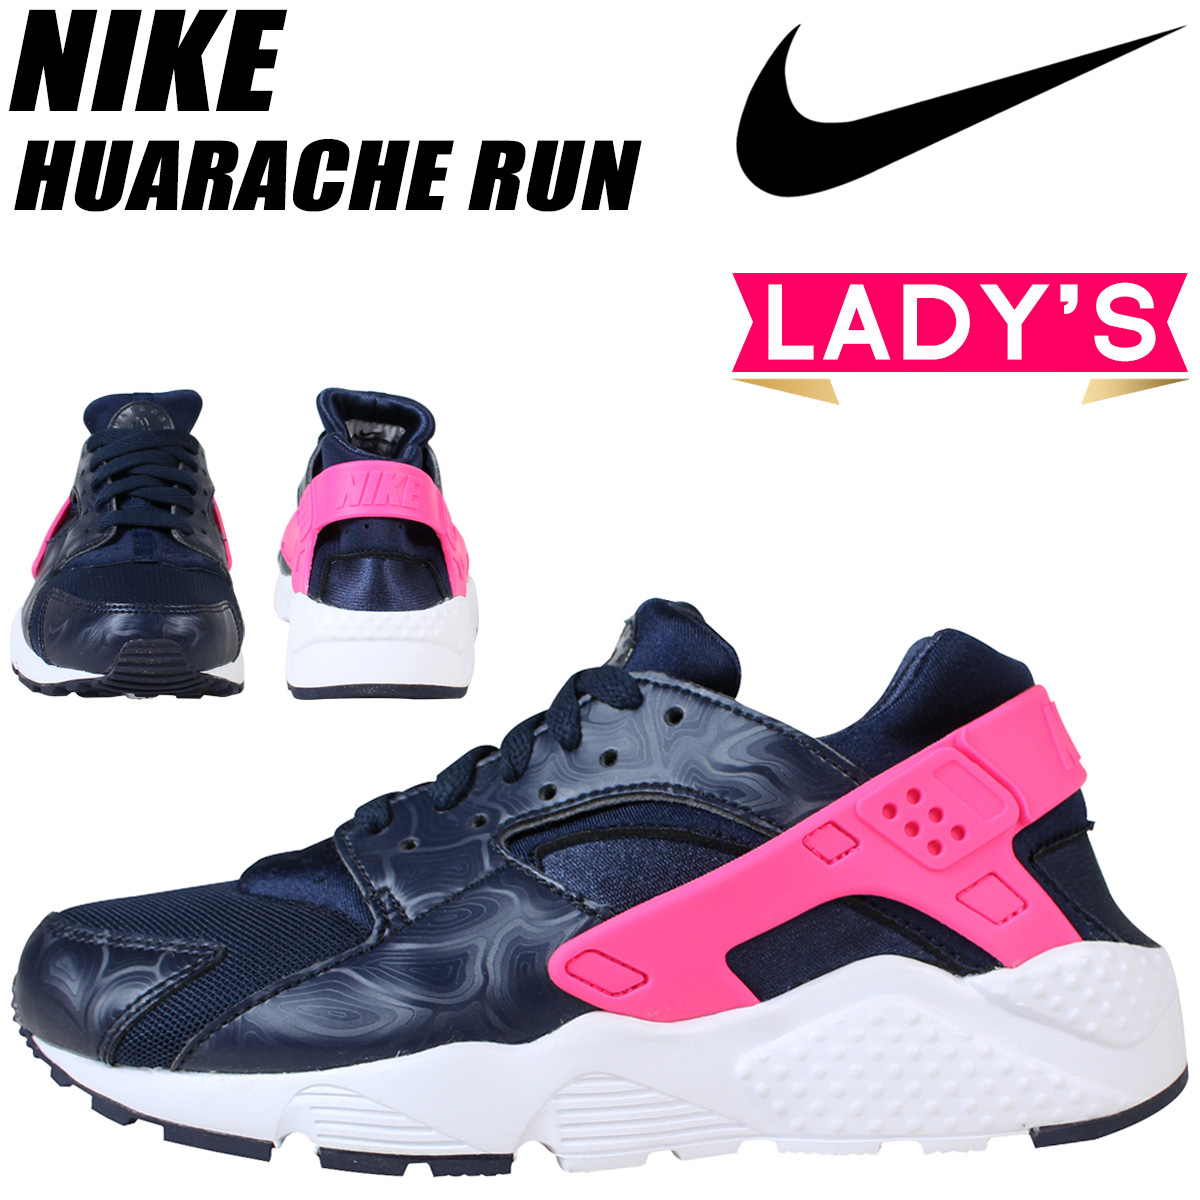 new styles 60263 193bb Haratilland Womens Sneakers Huarache Run AllsportsNike Gs bDeEH9W2IY